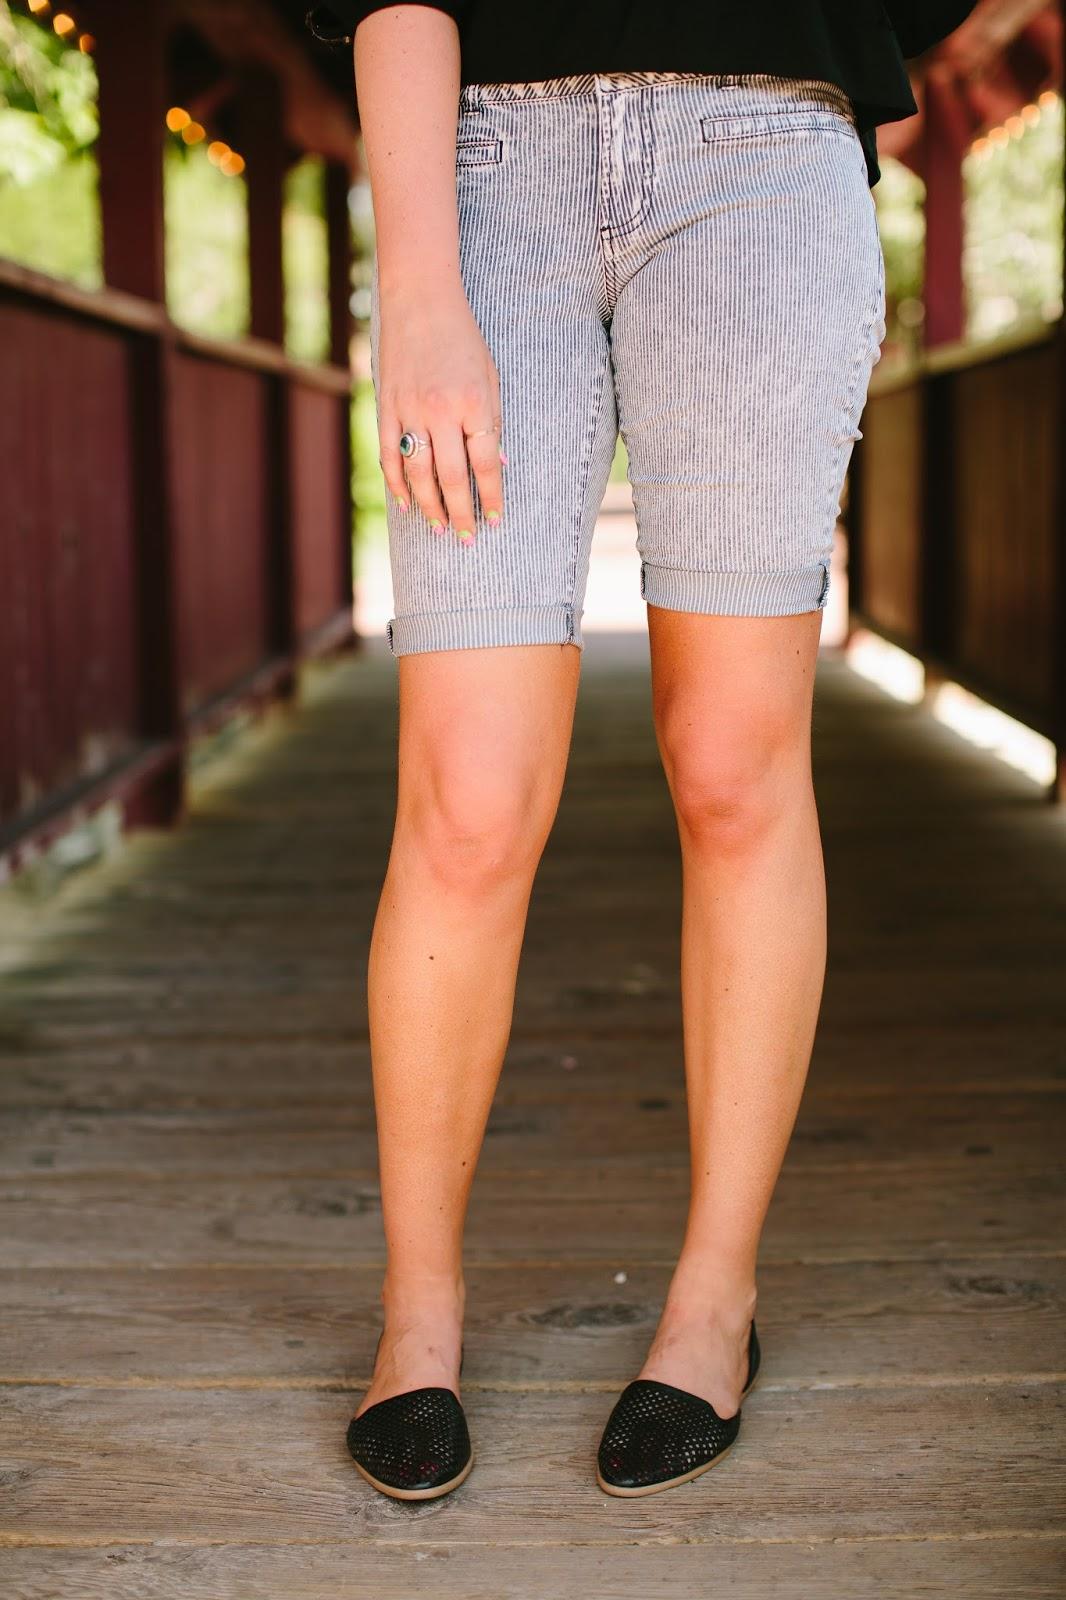 Modest Shorts, Striped Shorts, Cute shorts